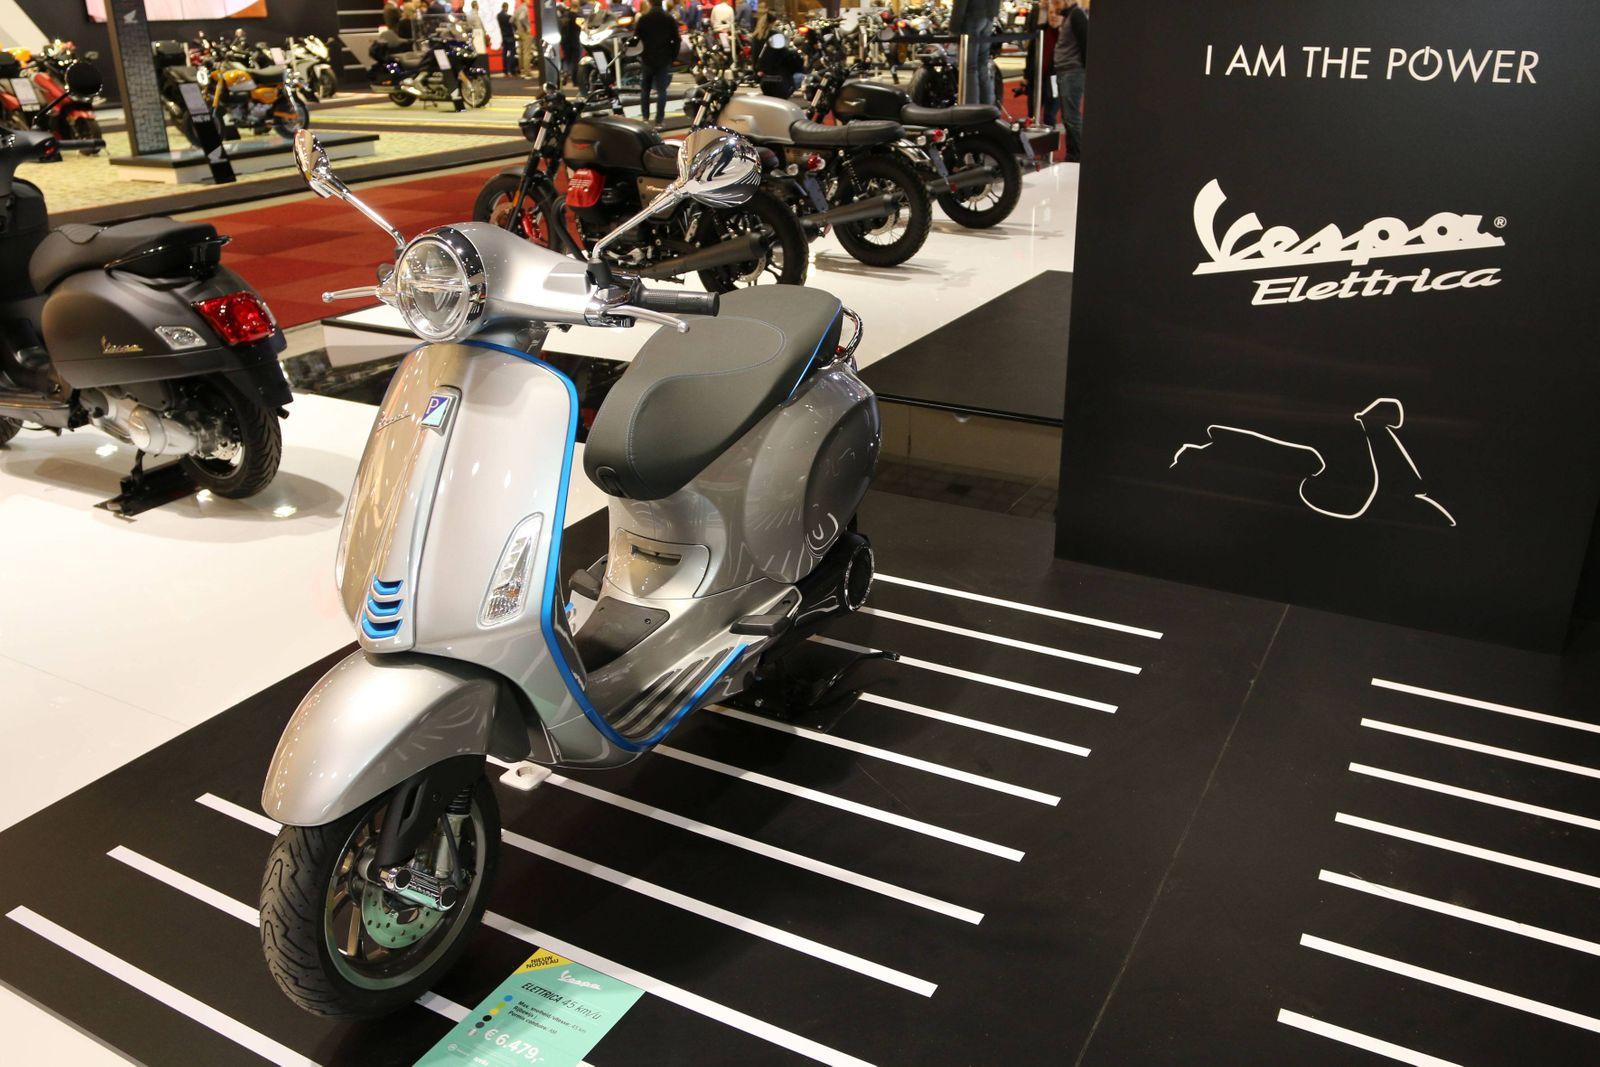 Piaggio Vespa Elettrica Elektro Motorroller 97 European Motor Show Brussels Salon Auto Moto Van